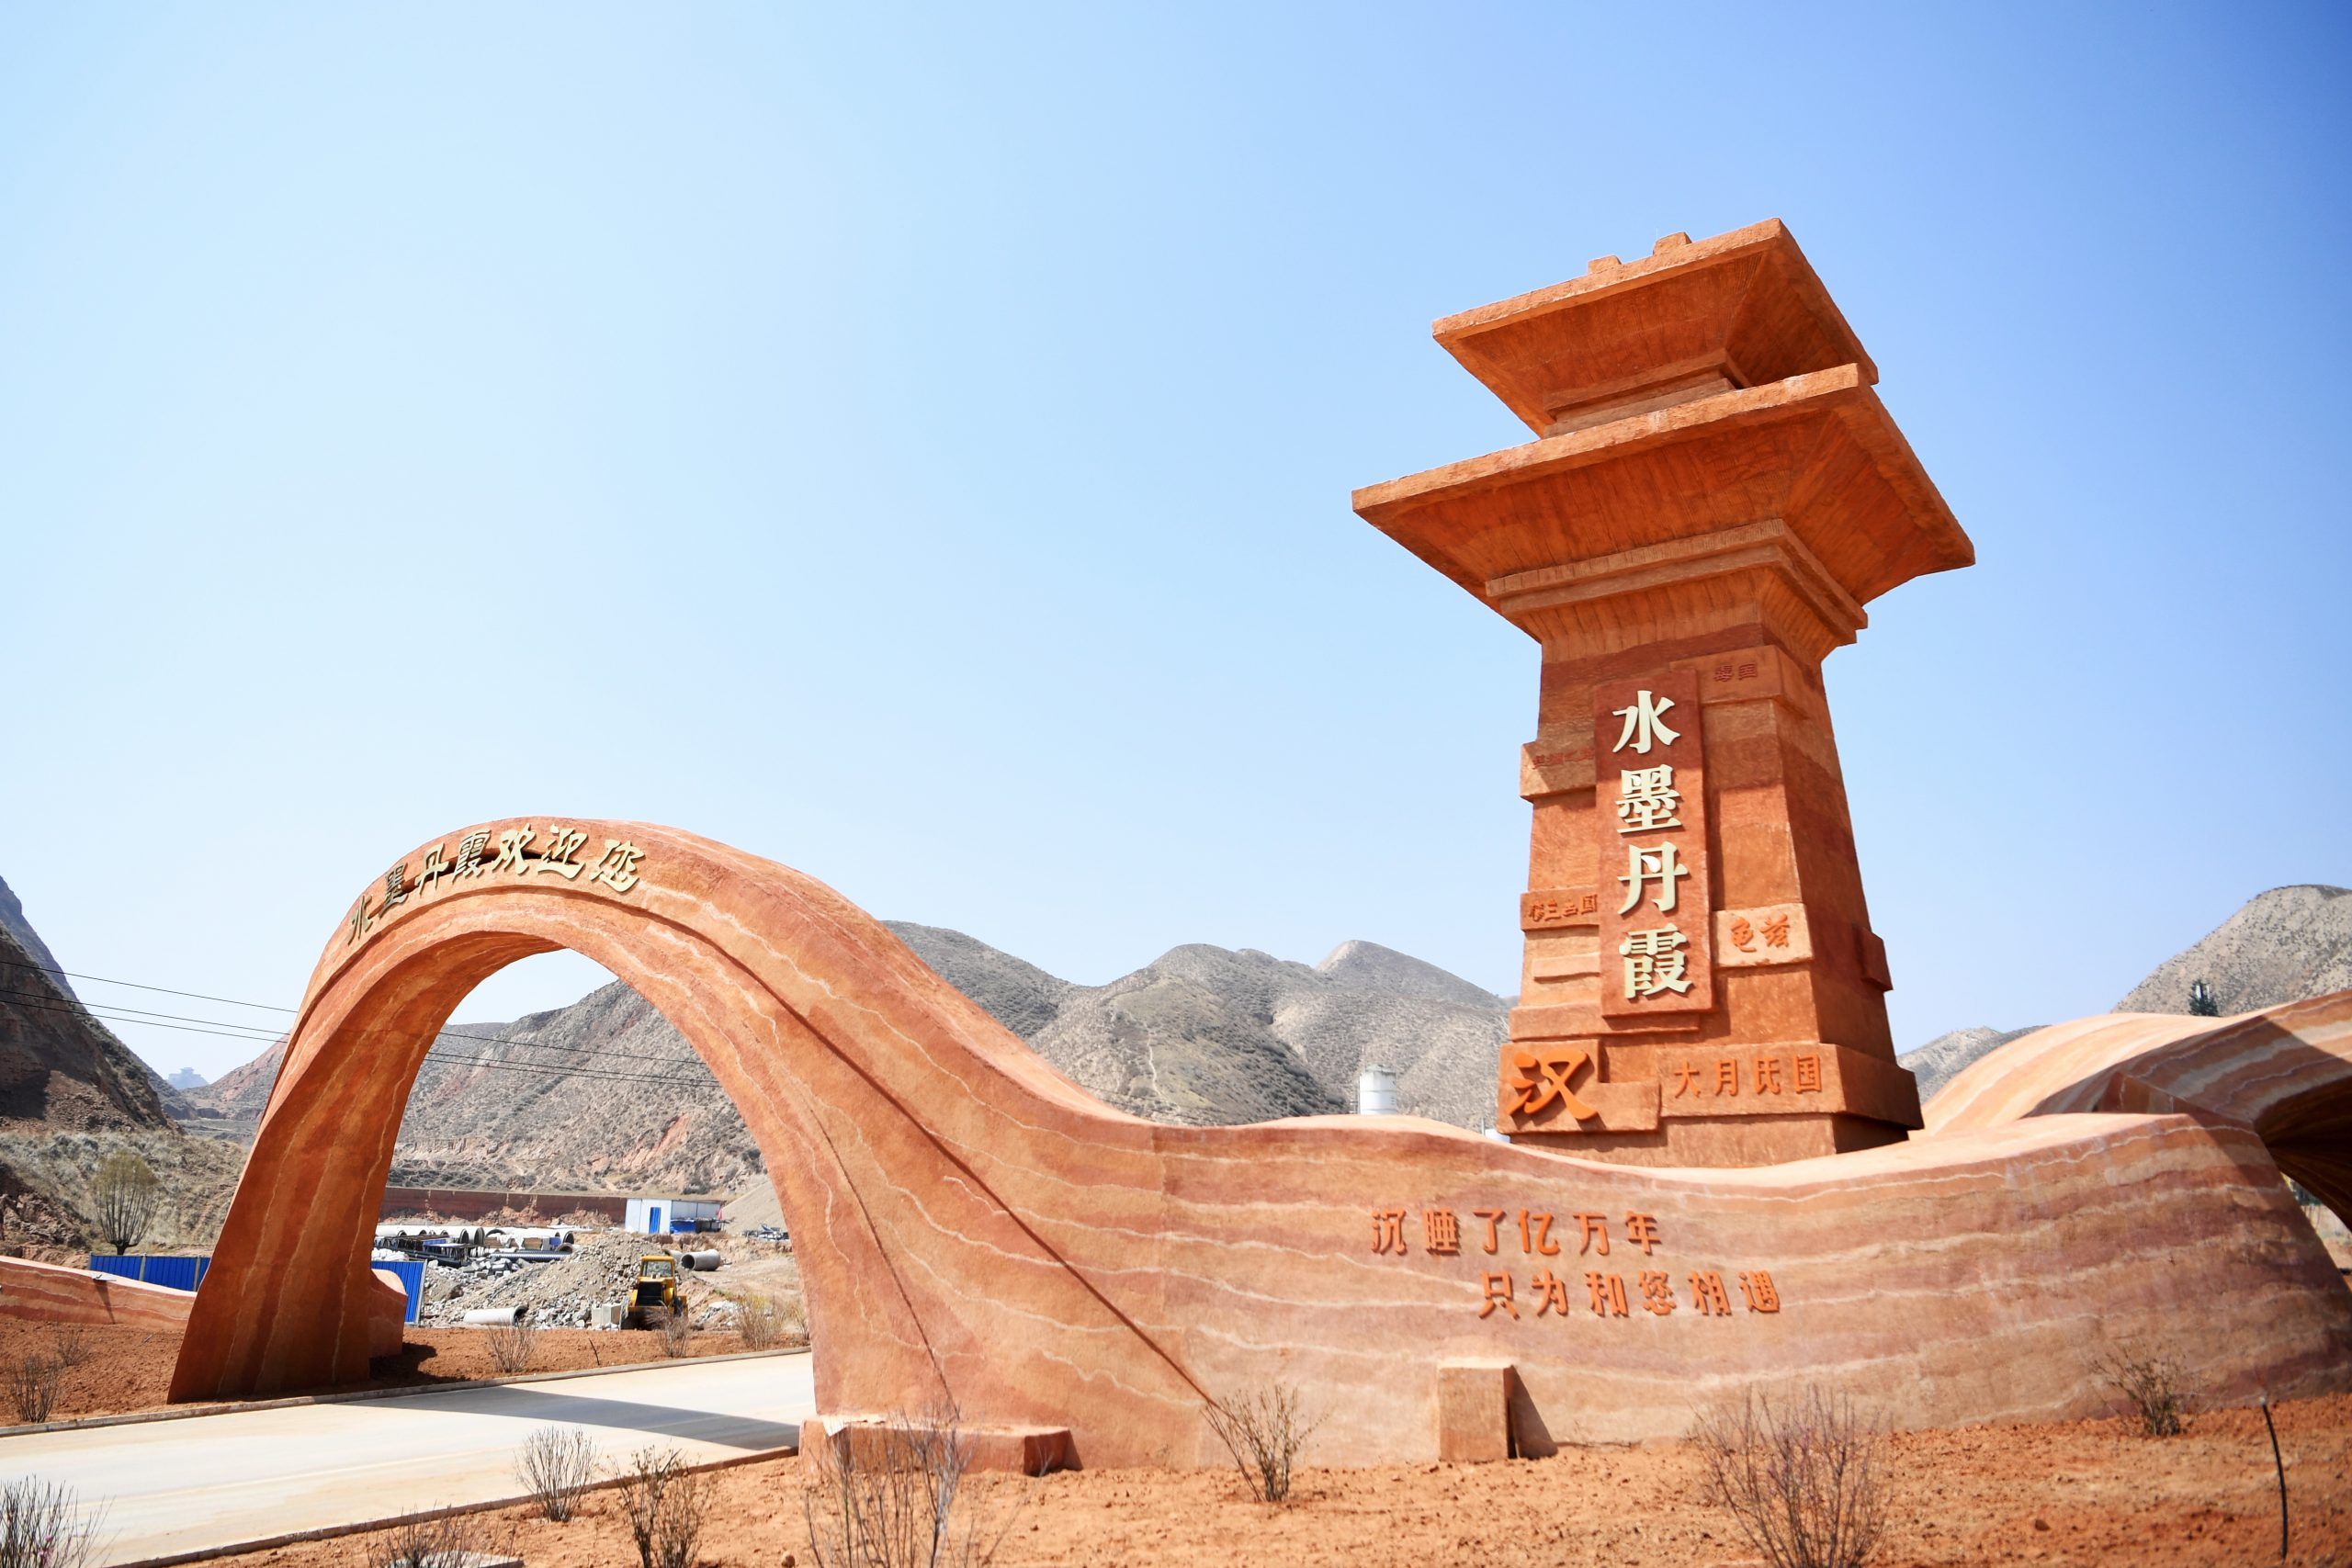 CHINA-GANSU-LANZHOU-DANXIA LANDFORM (CN)